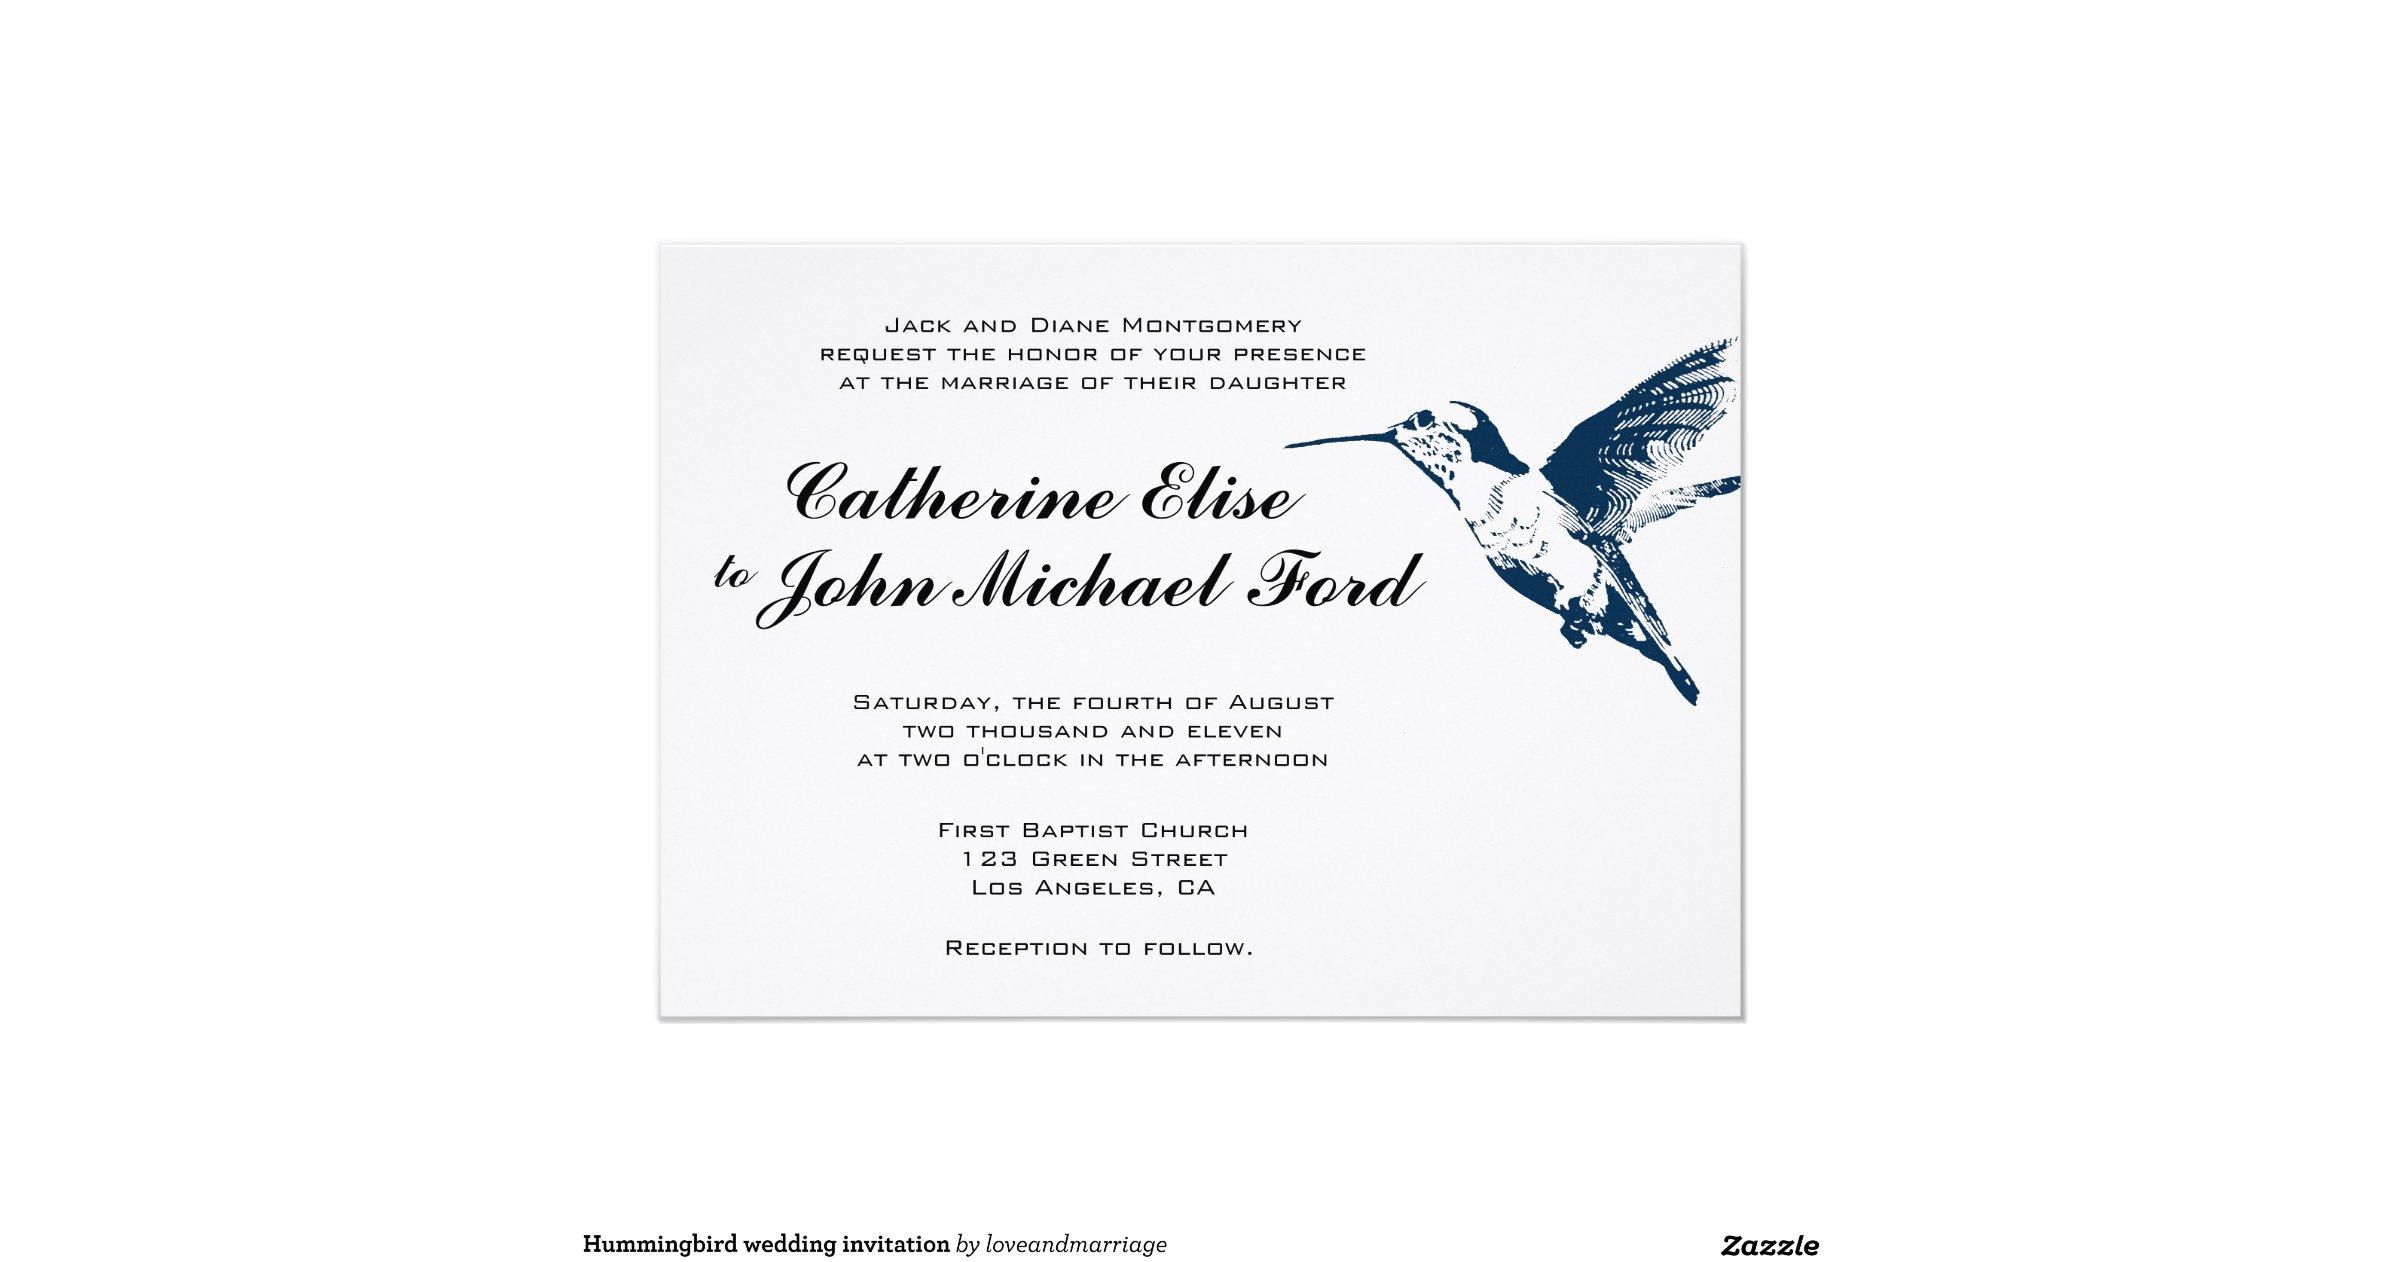 Hummingbird Wedding Invitations: Hummingbird_wedding_invitation